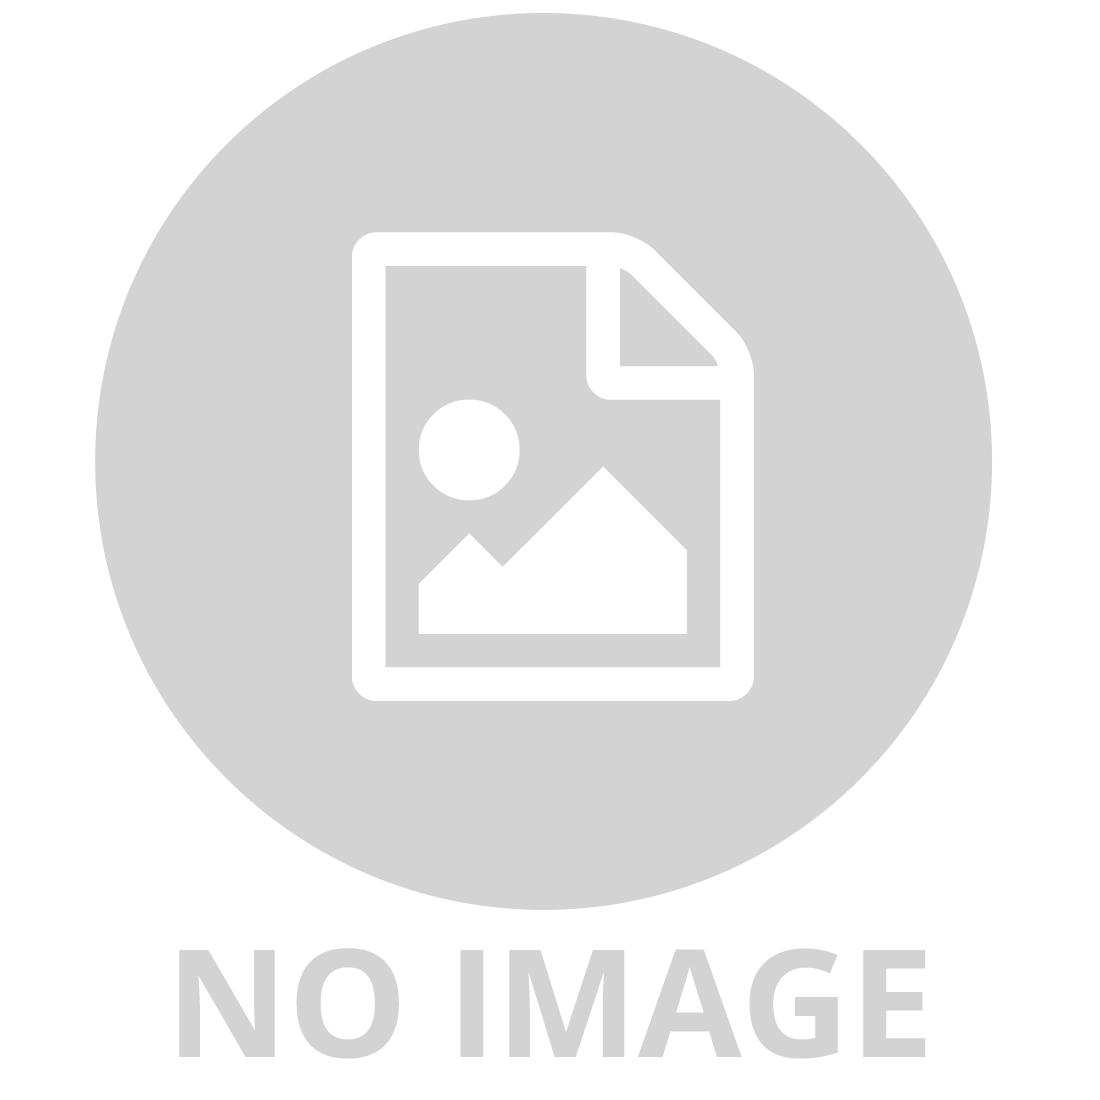 RAVENSBURGER 300 PIECE PUZZLE - SOLAR SYSTEM